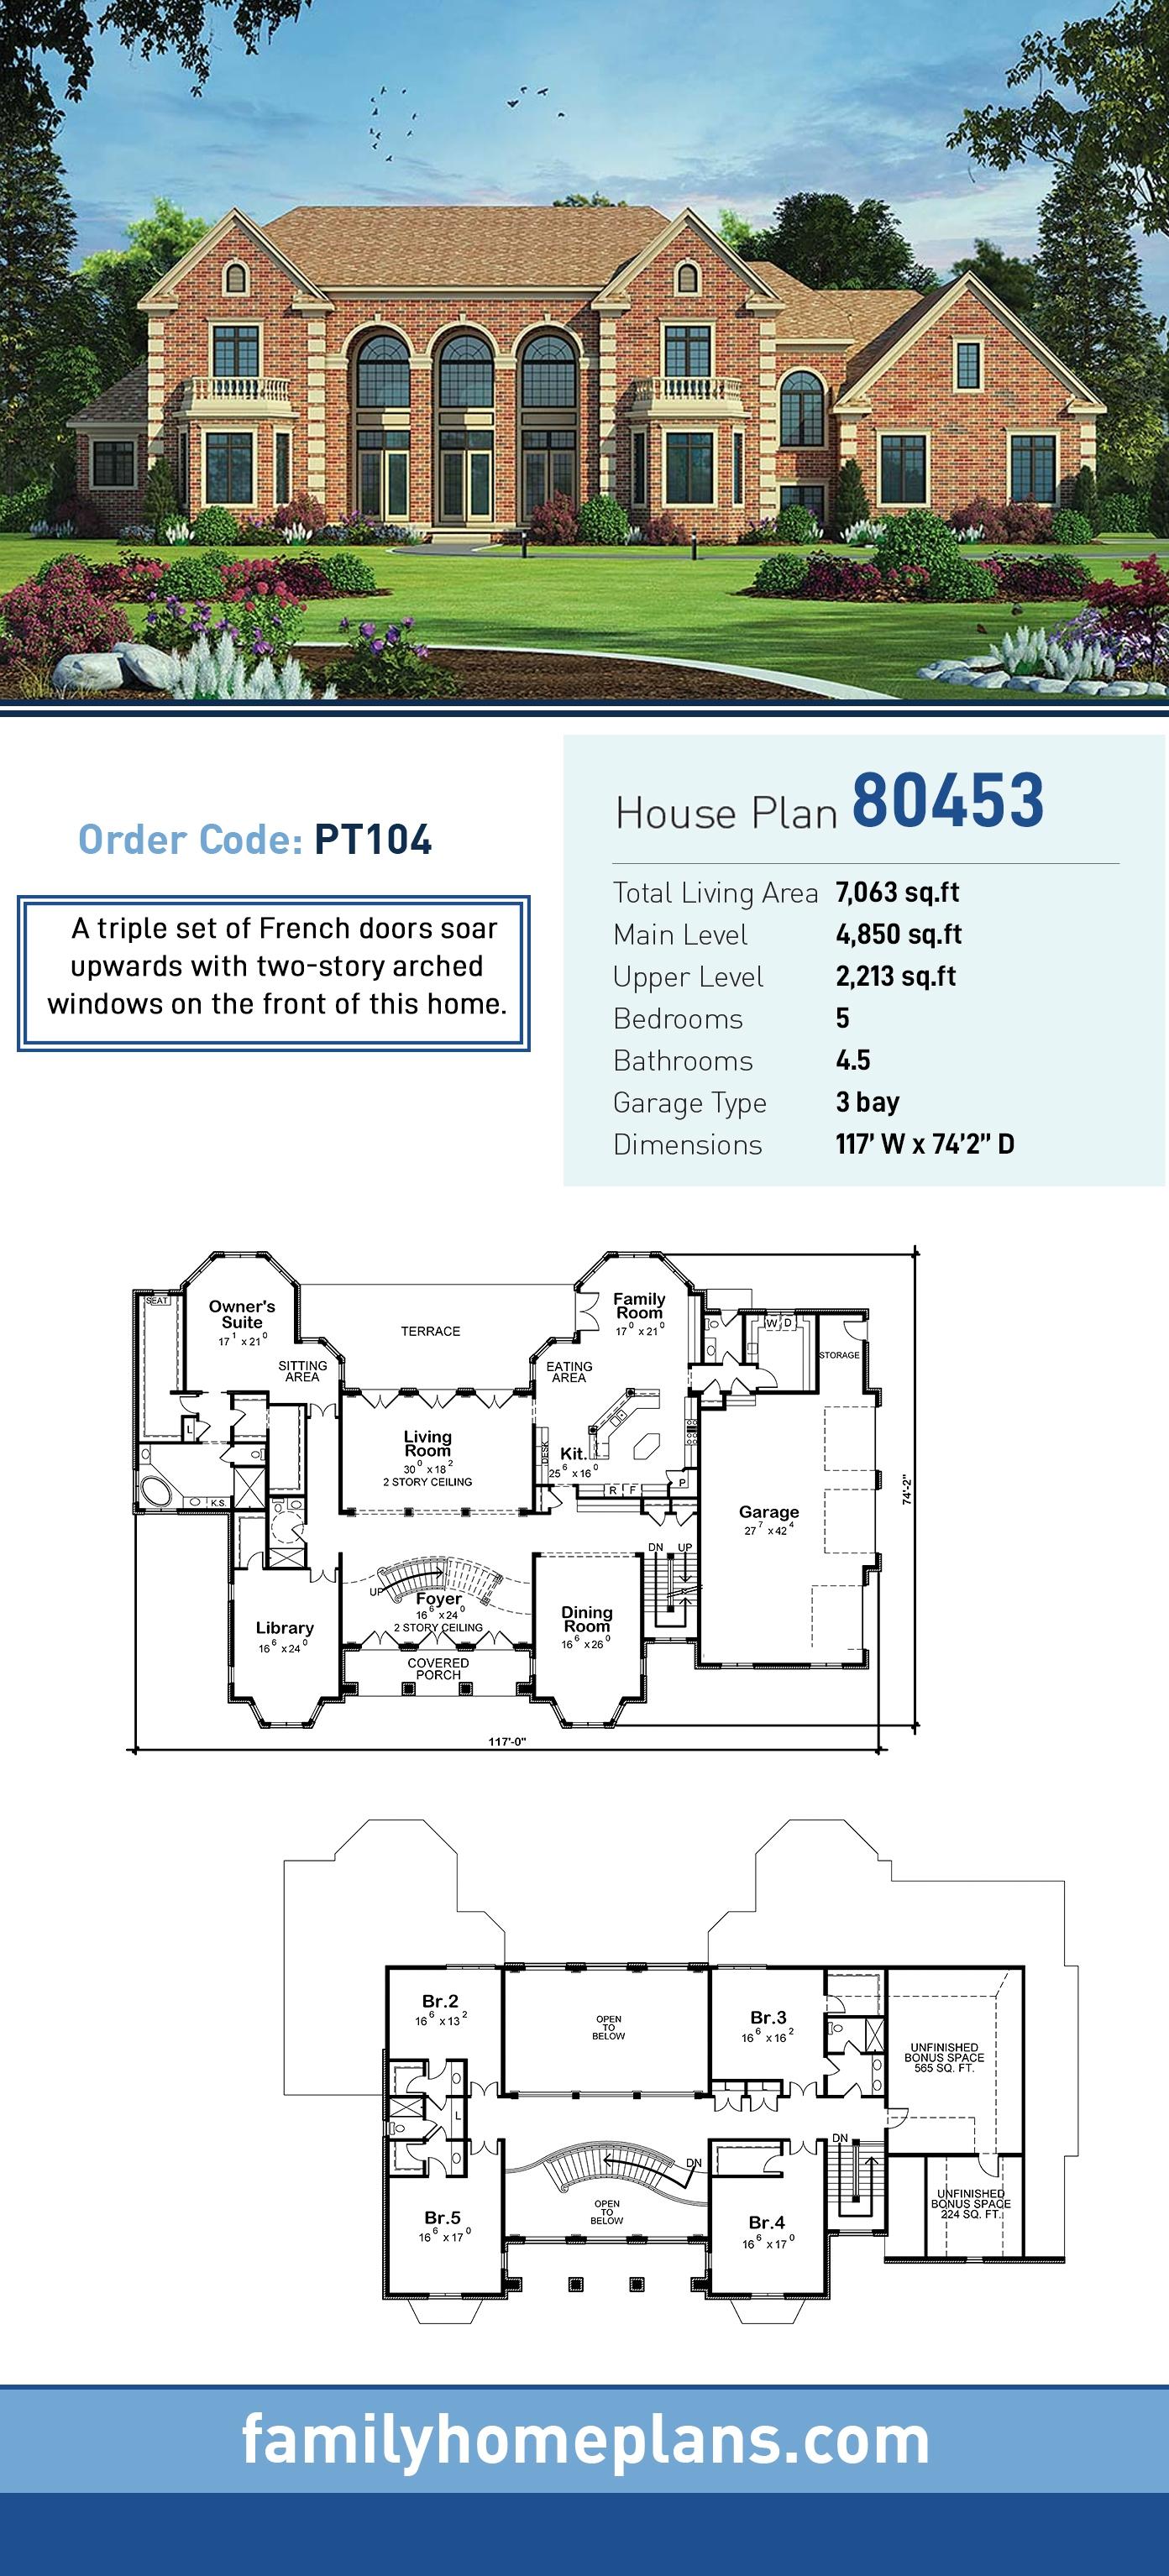 European House Plan 80453 with 5 Beds, 5 Baths, 3 Car Garage